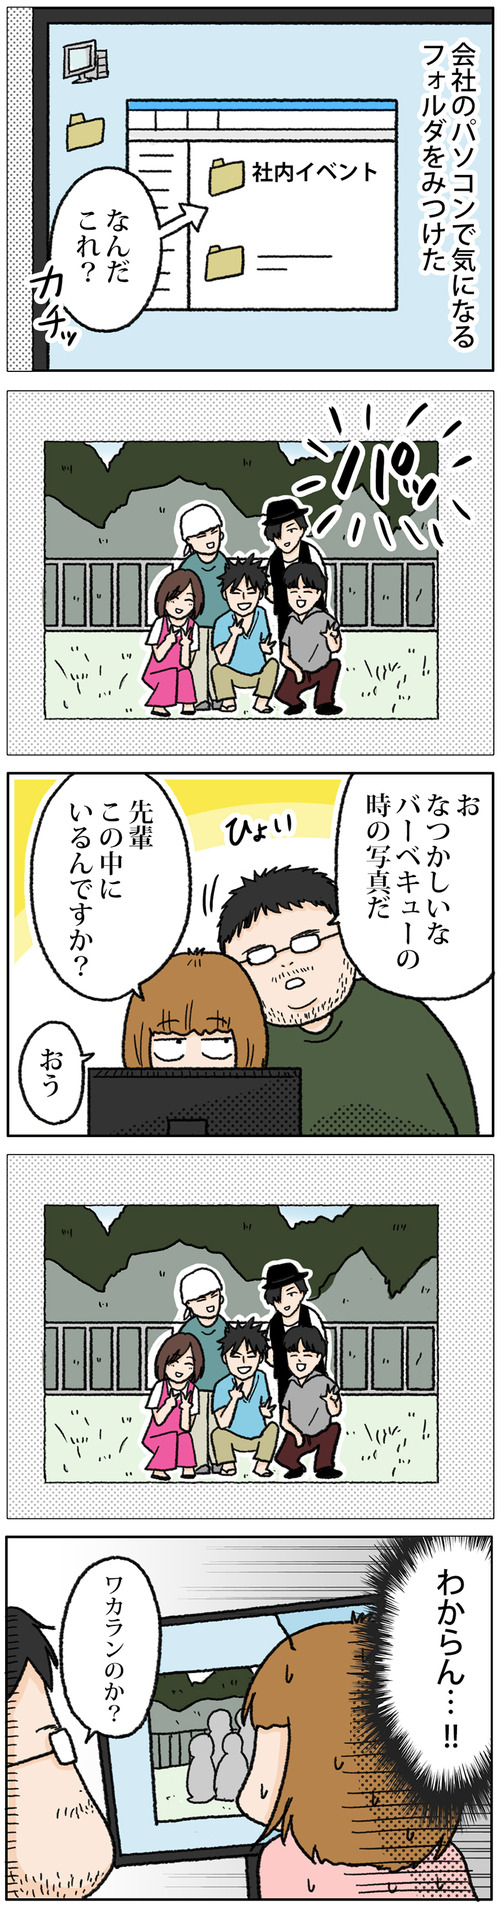 zangyo_170928_1